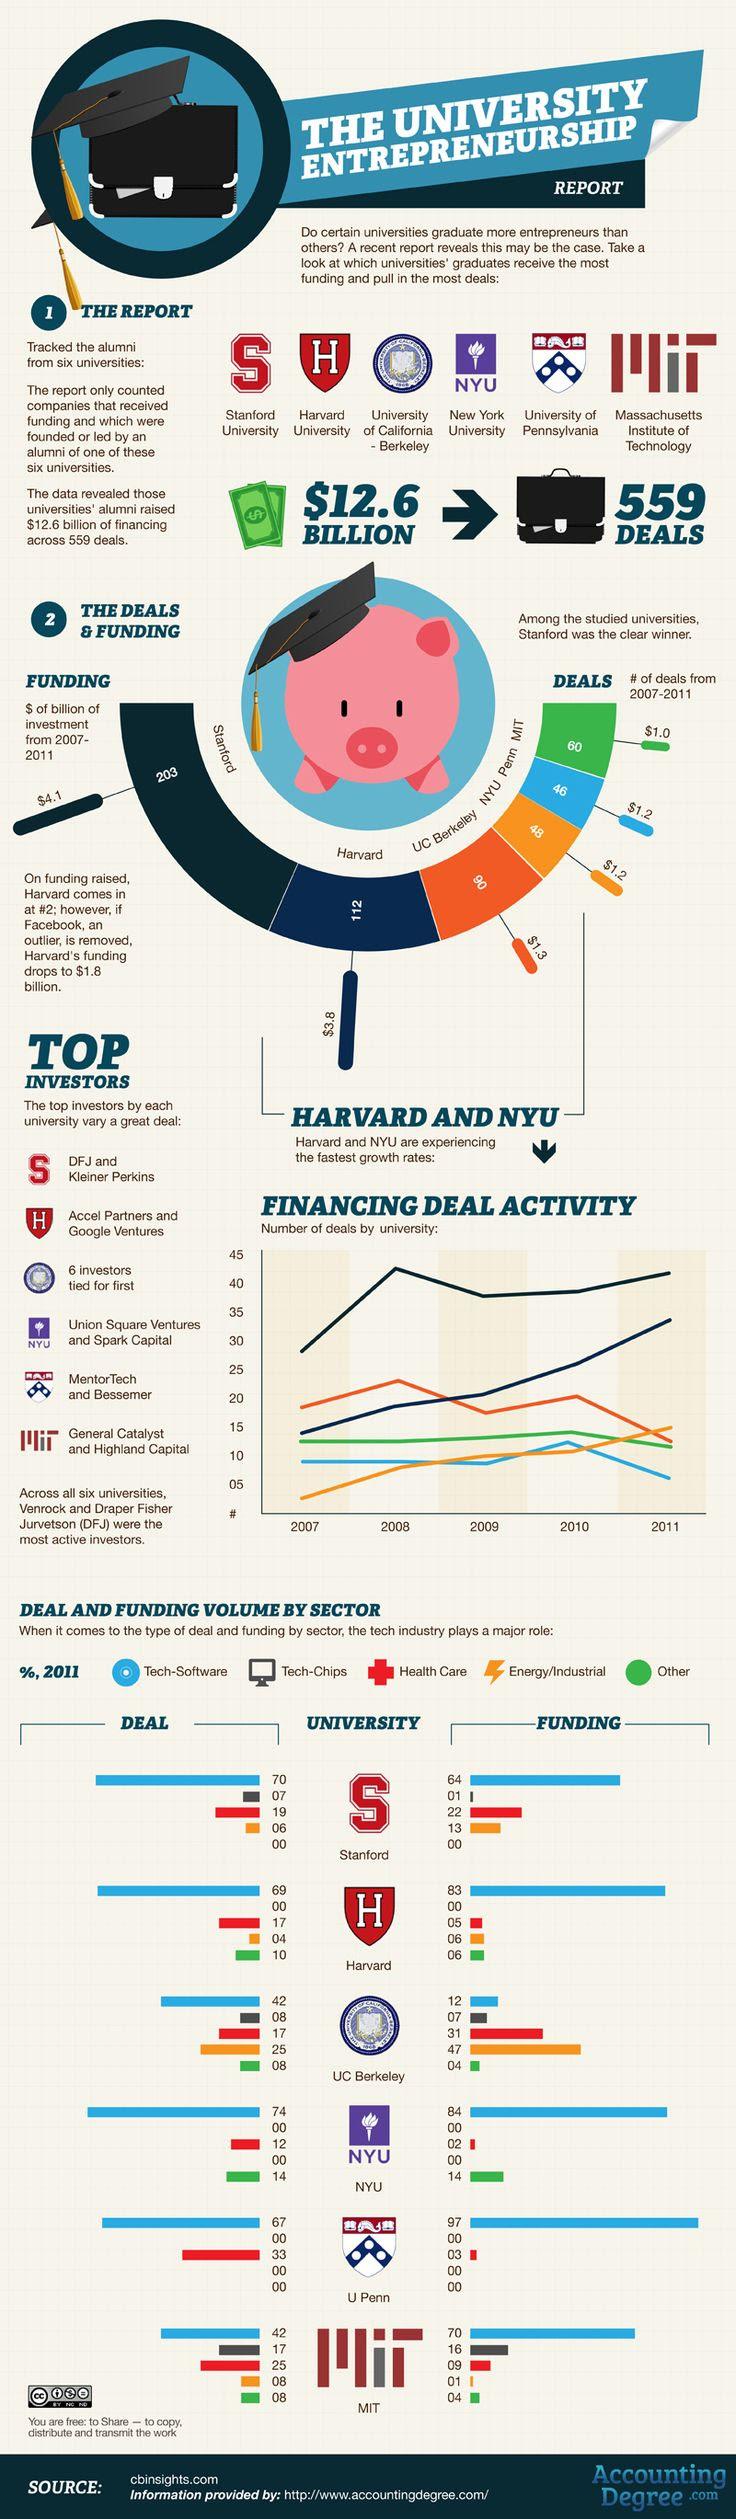 The University Entrepreneurshi